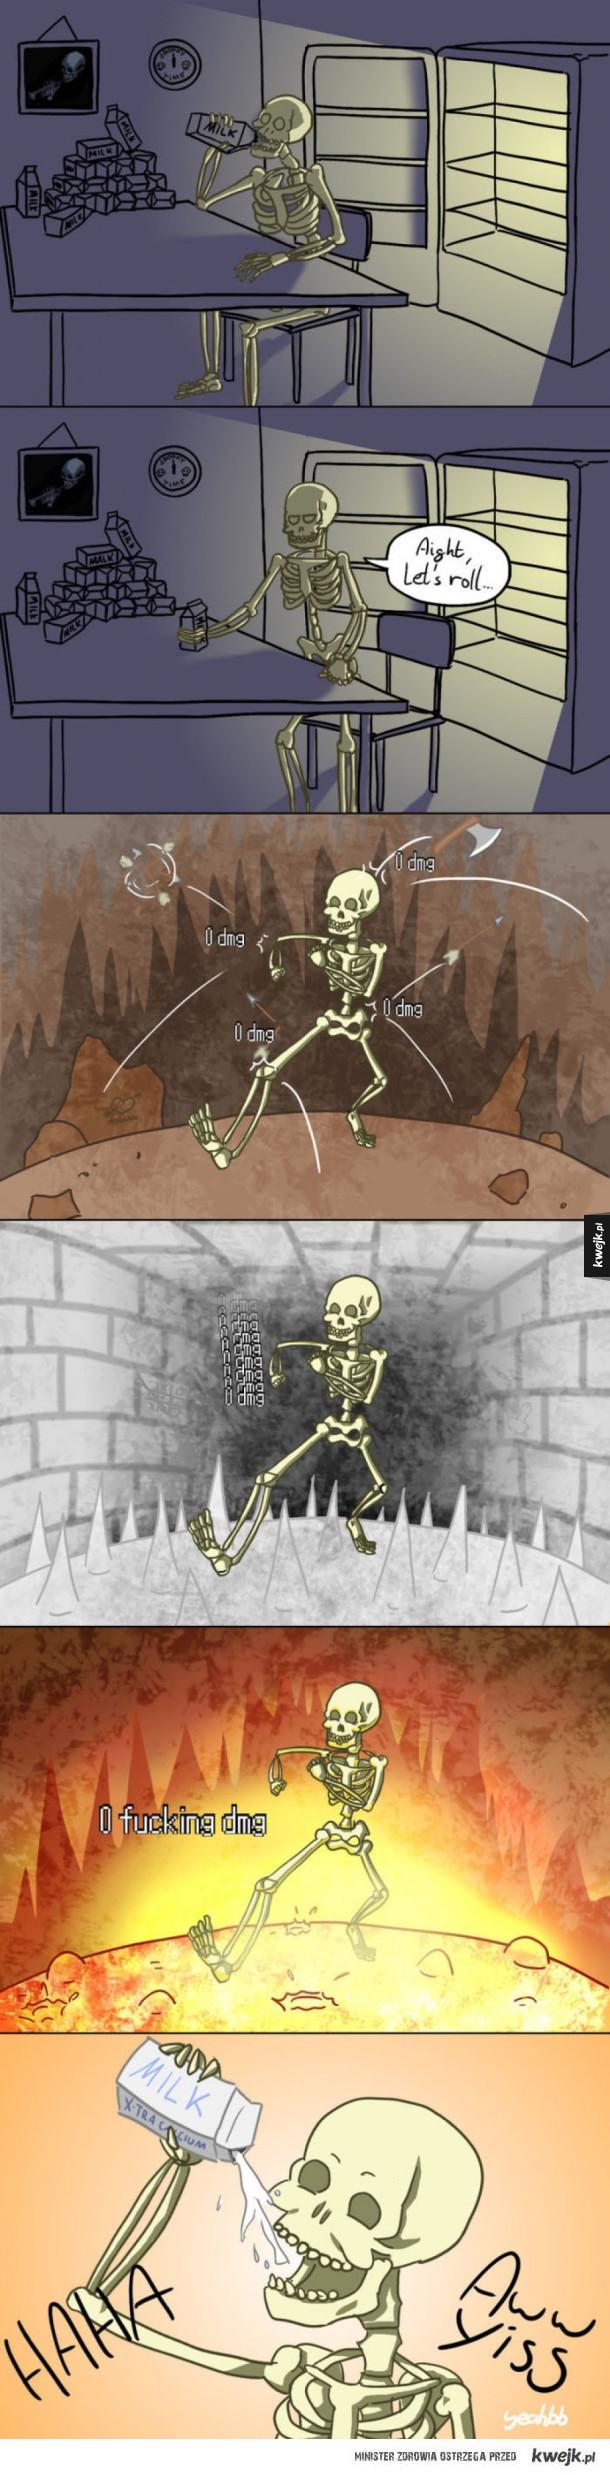 Co ten szkielet